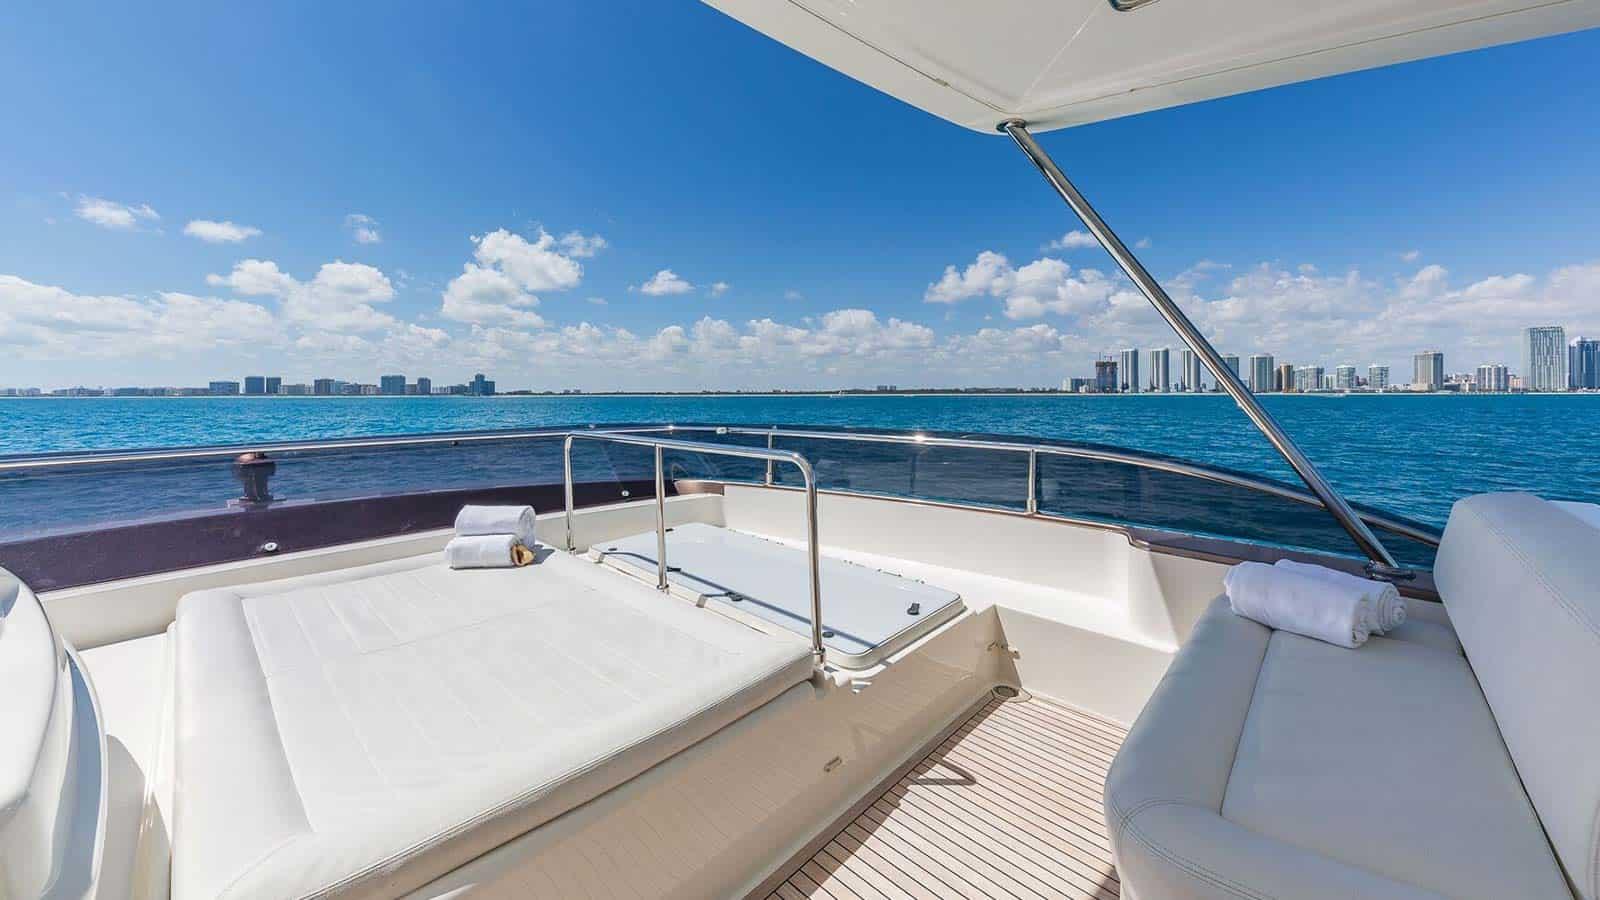 South Beach Yacht Party